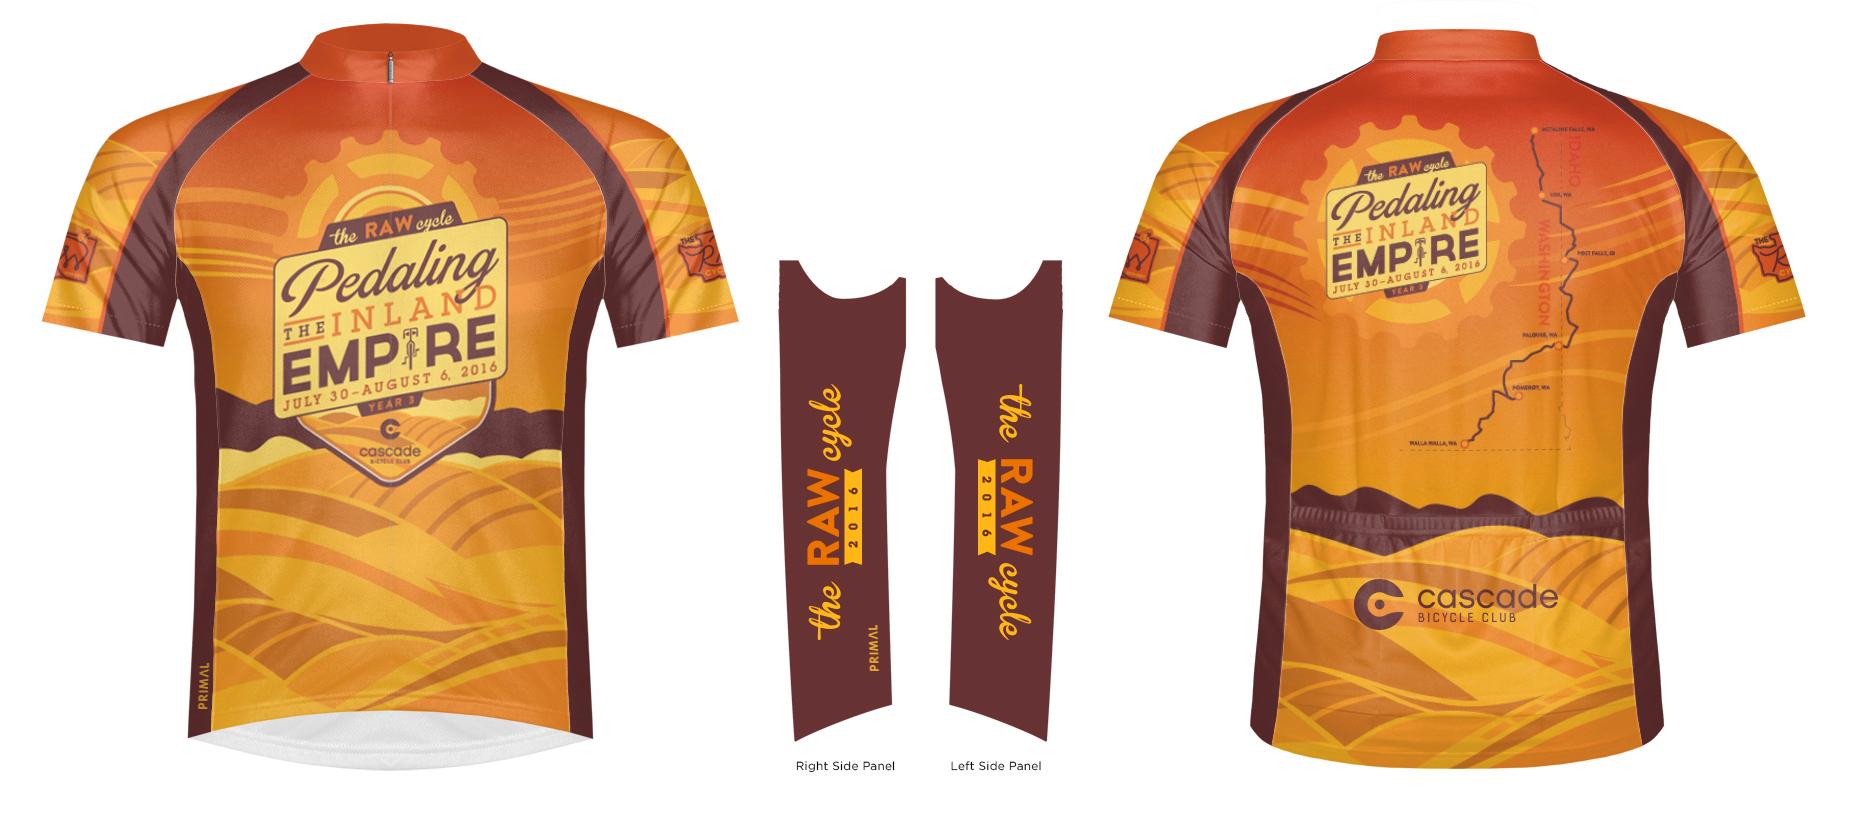 2016 Bike Jersey   Image rendering courtesy of Primal.